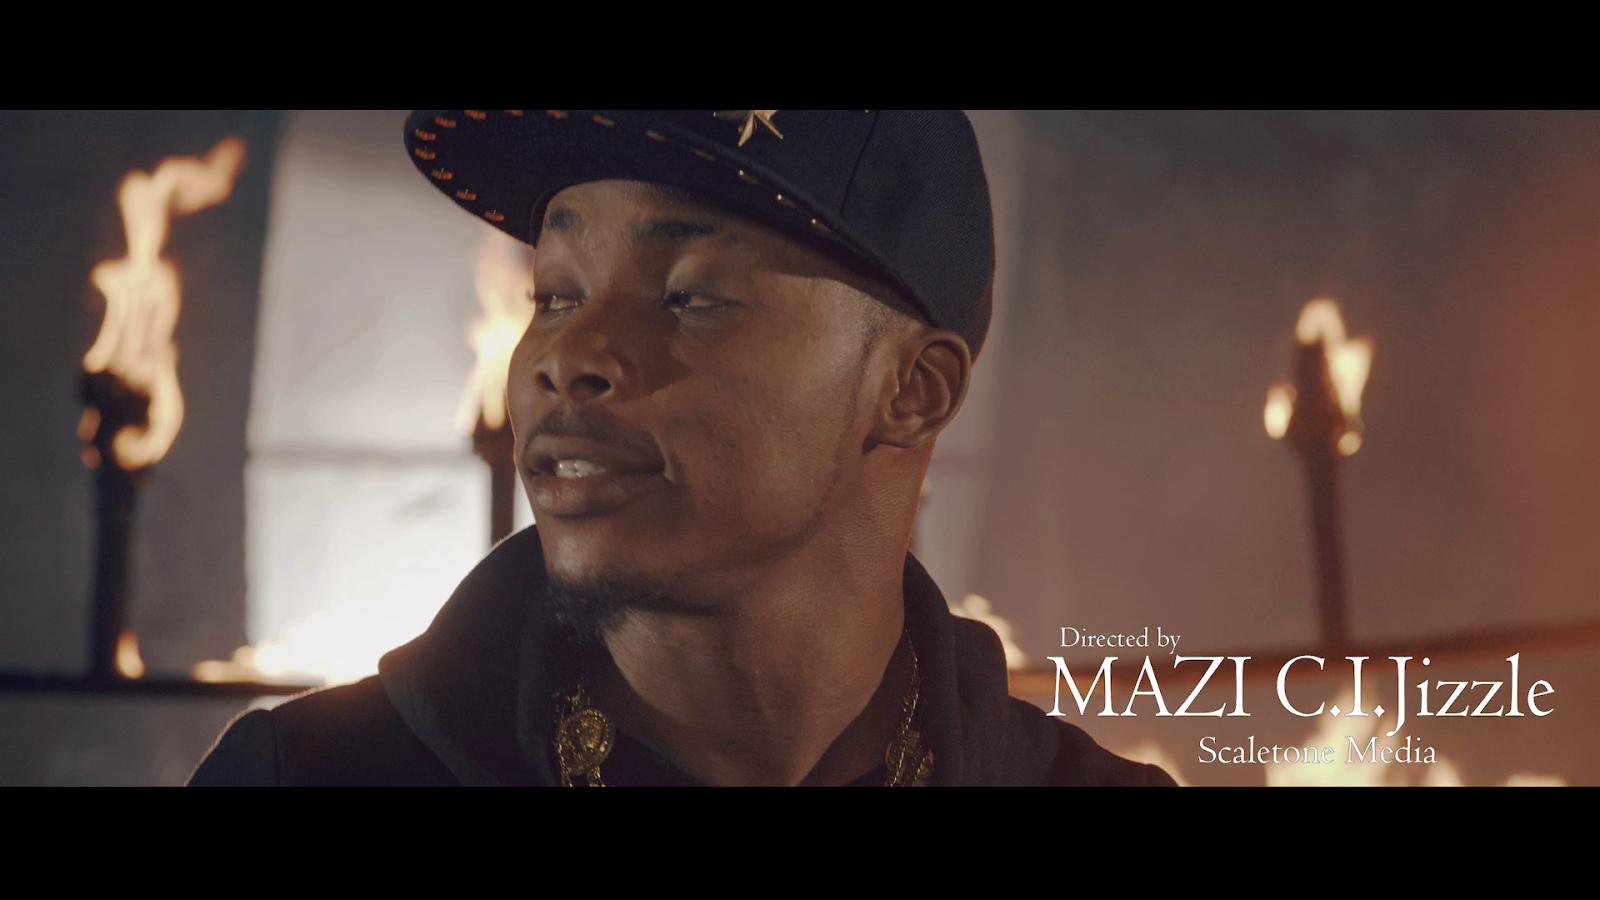 VIDEO: MACORE (@gegemukingmacor) – MODIMBA [DIR C.I.JIZZLE] #ModimbaVideoByMacore